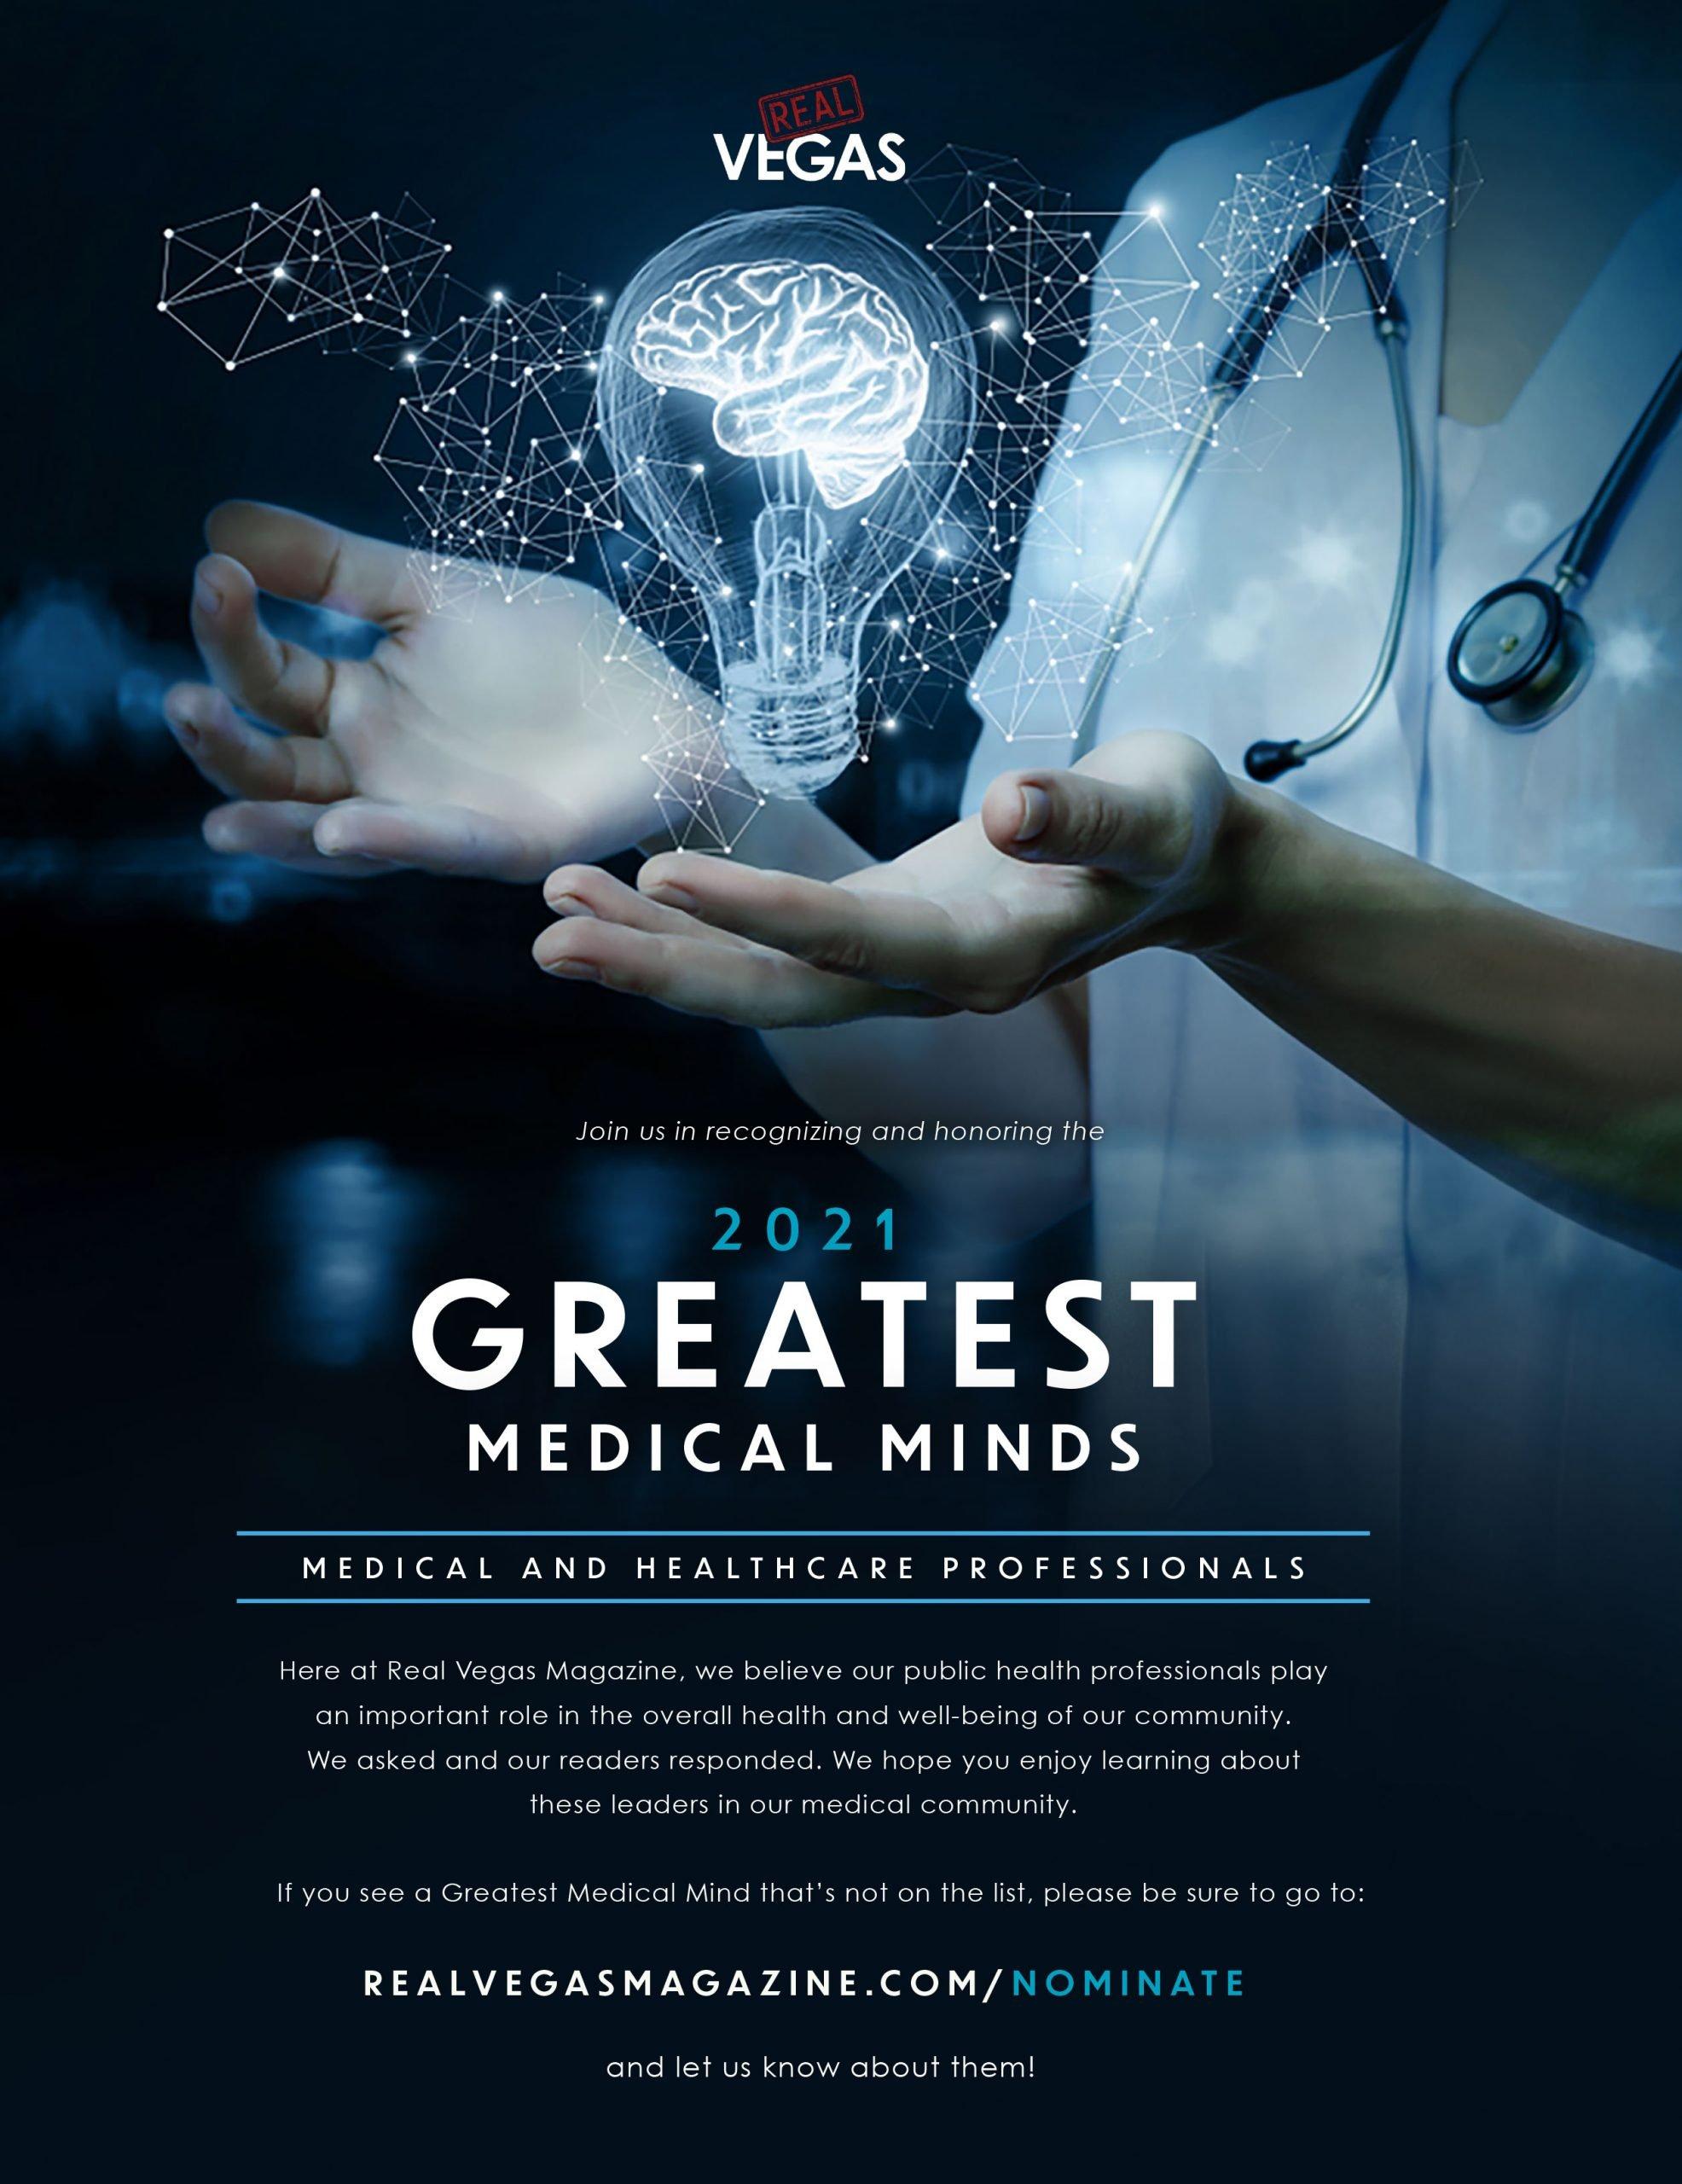 Greatest Medical Minds 2021